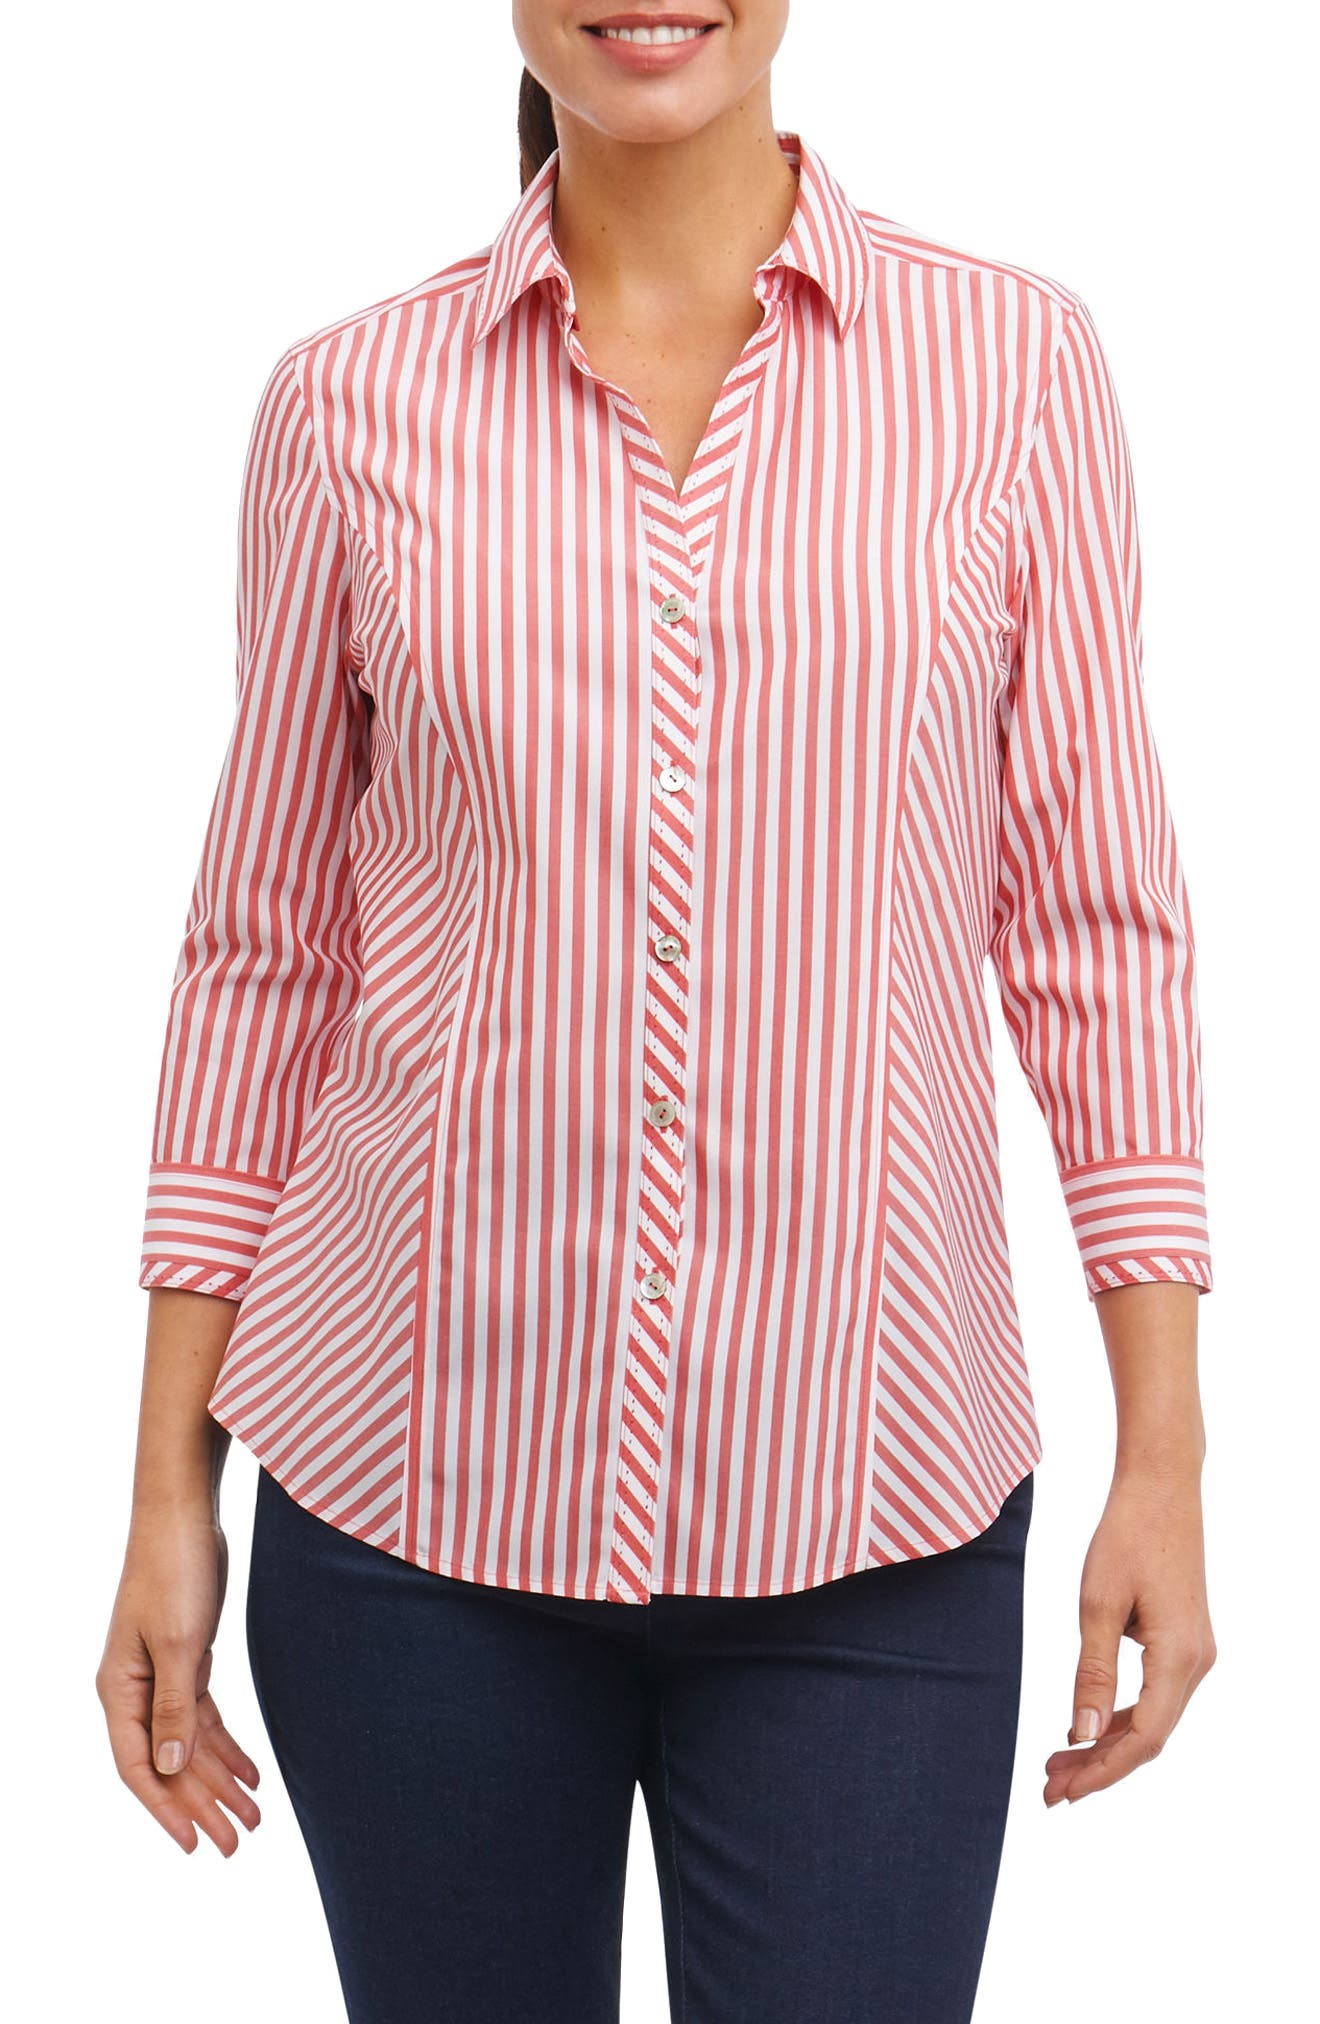 Hope Preppy Stripe Cotton Shirt,                             Main thumbnail 1, color,                             Brick